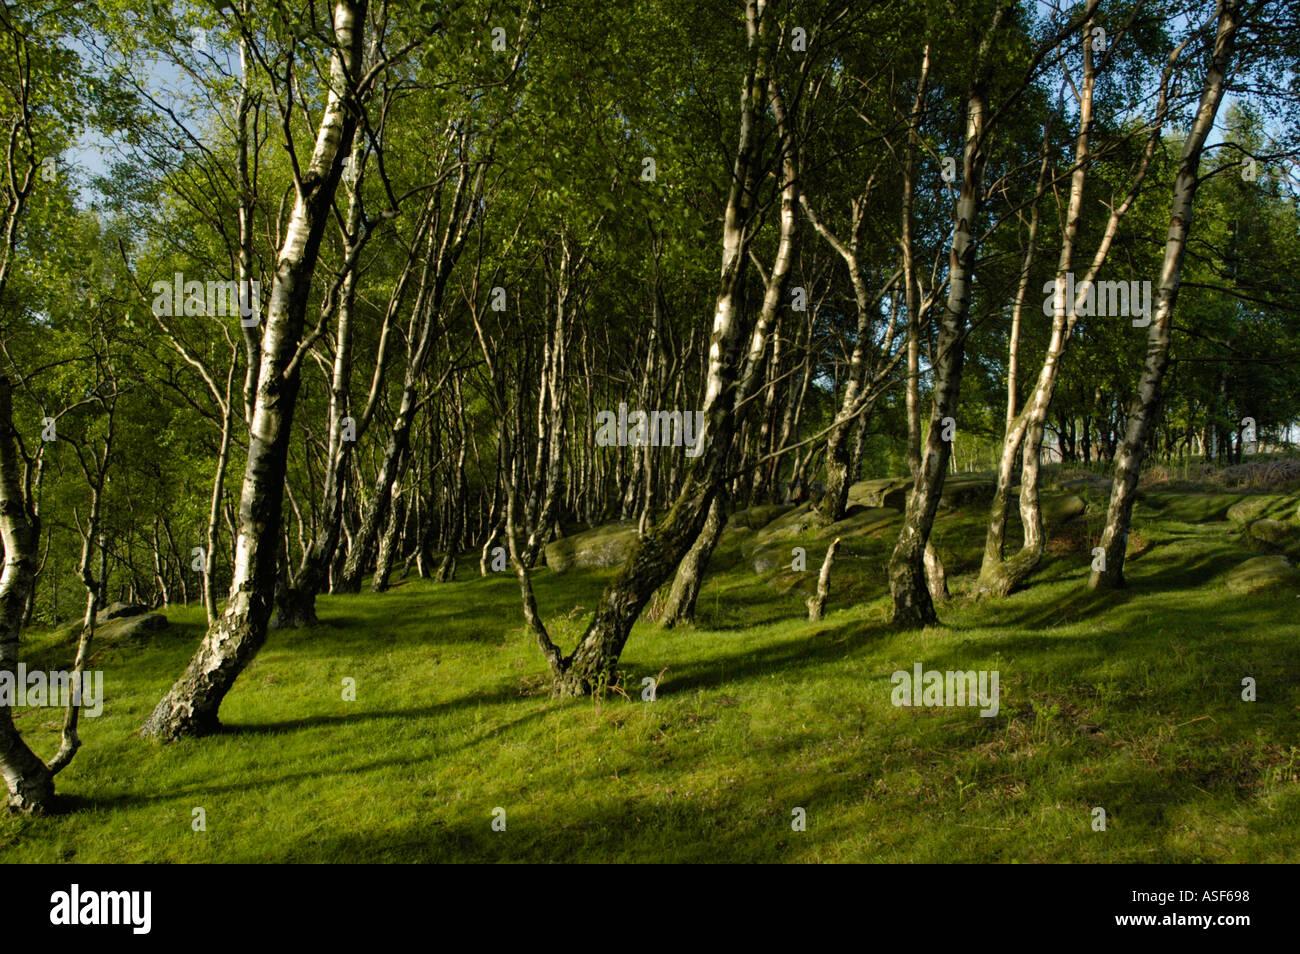 Silver birch trees on Froggatt Edge Derbyshire England - Stock Image